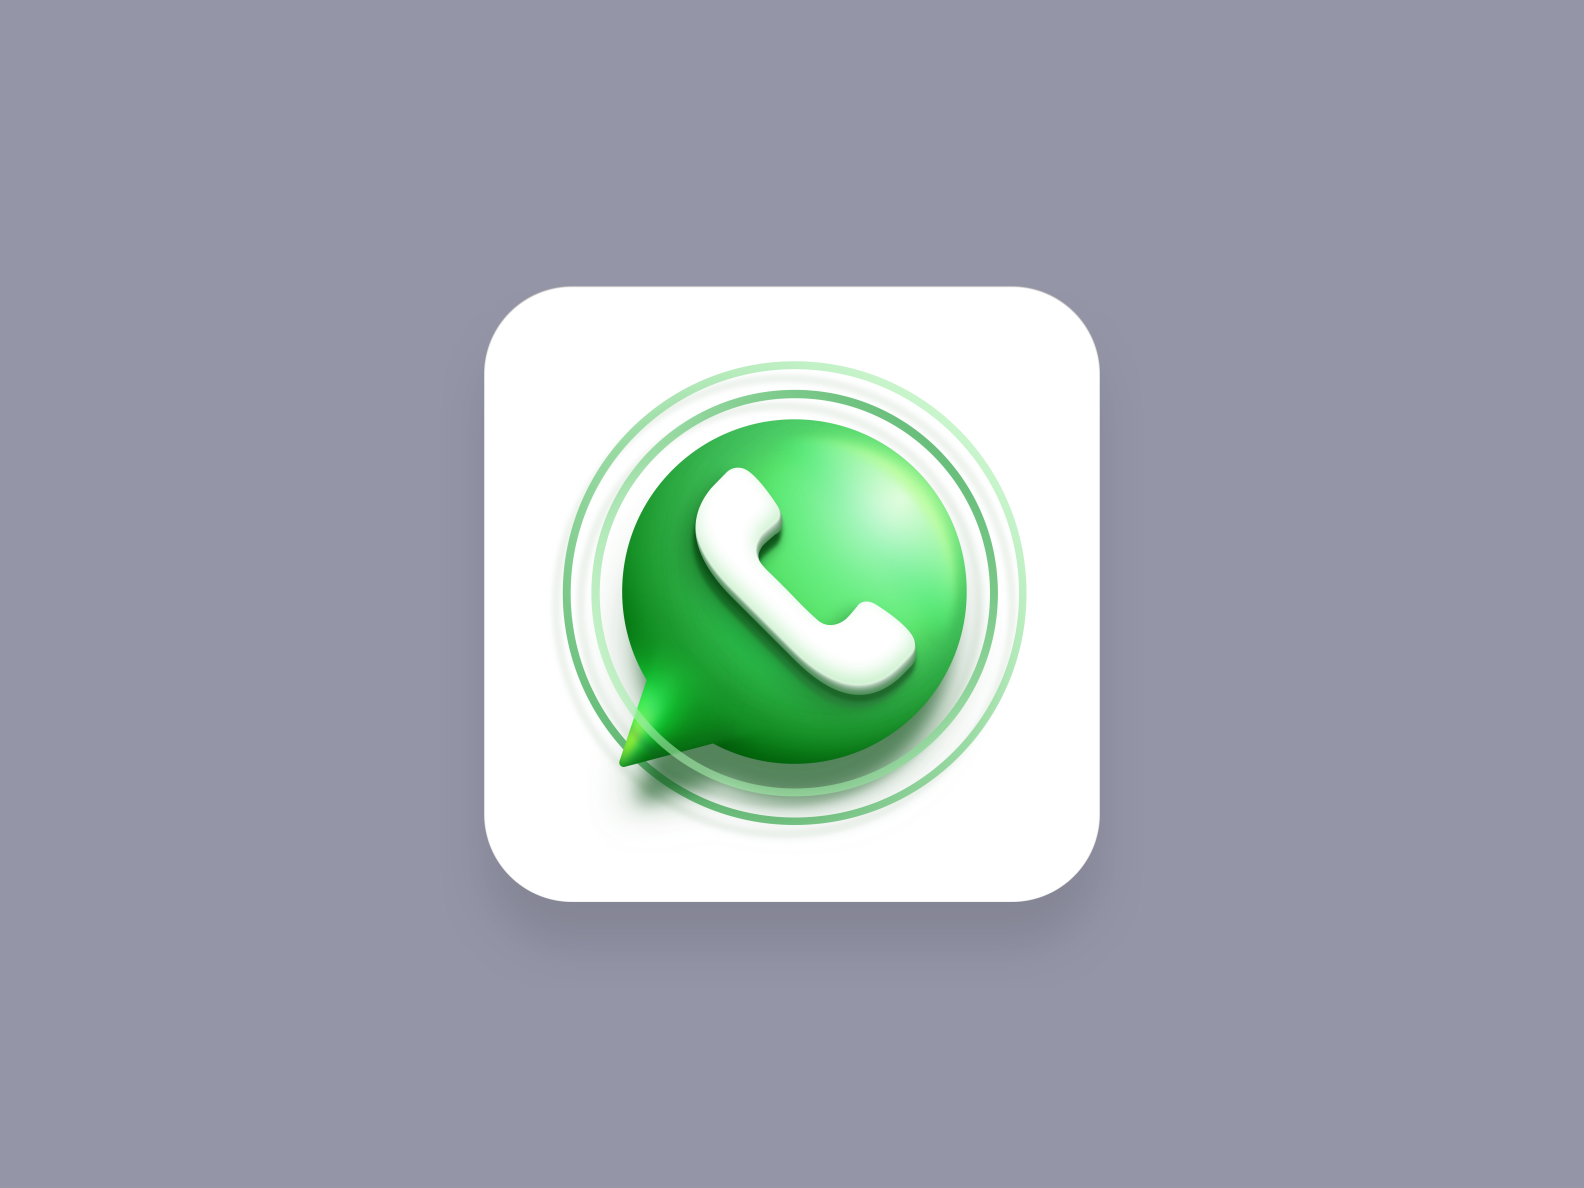 Whatsapp marketing icon (Big Sur style)